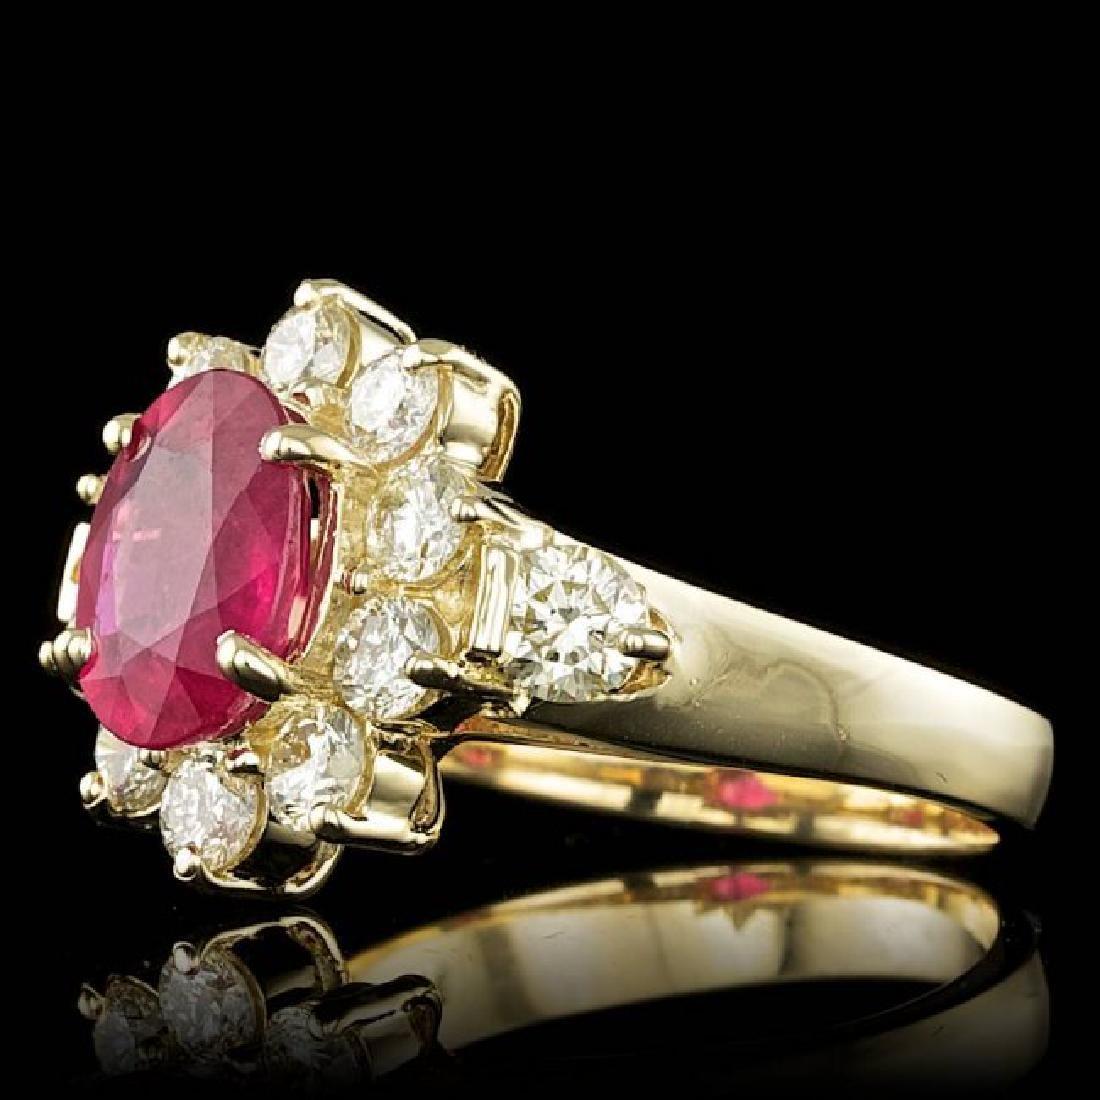 14k Yellow Gold 2.50ct Ruby 1.50ct Diamond Ring - 2